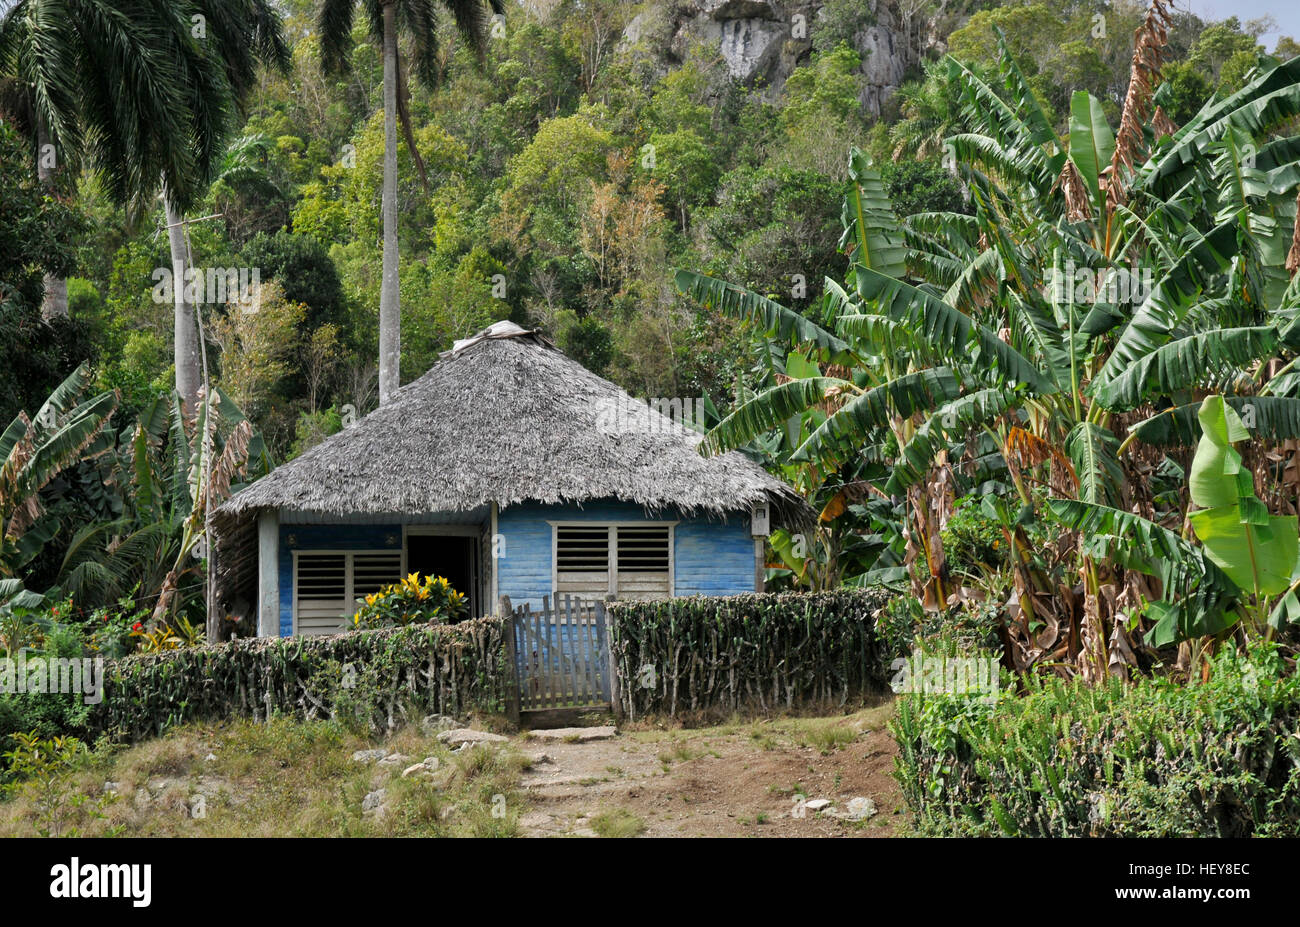 Farm house Holguin province Cuba - Stock Image